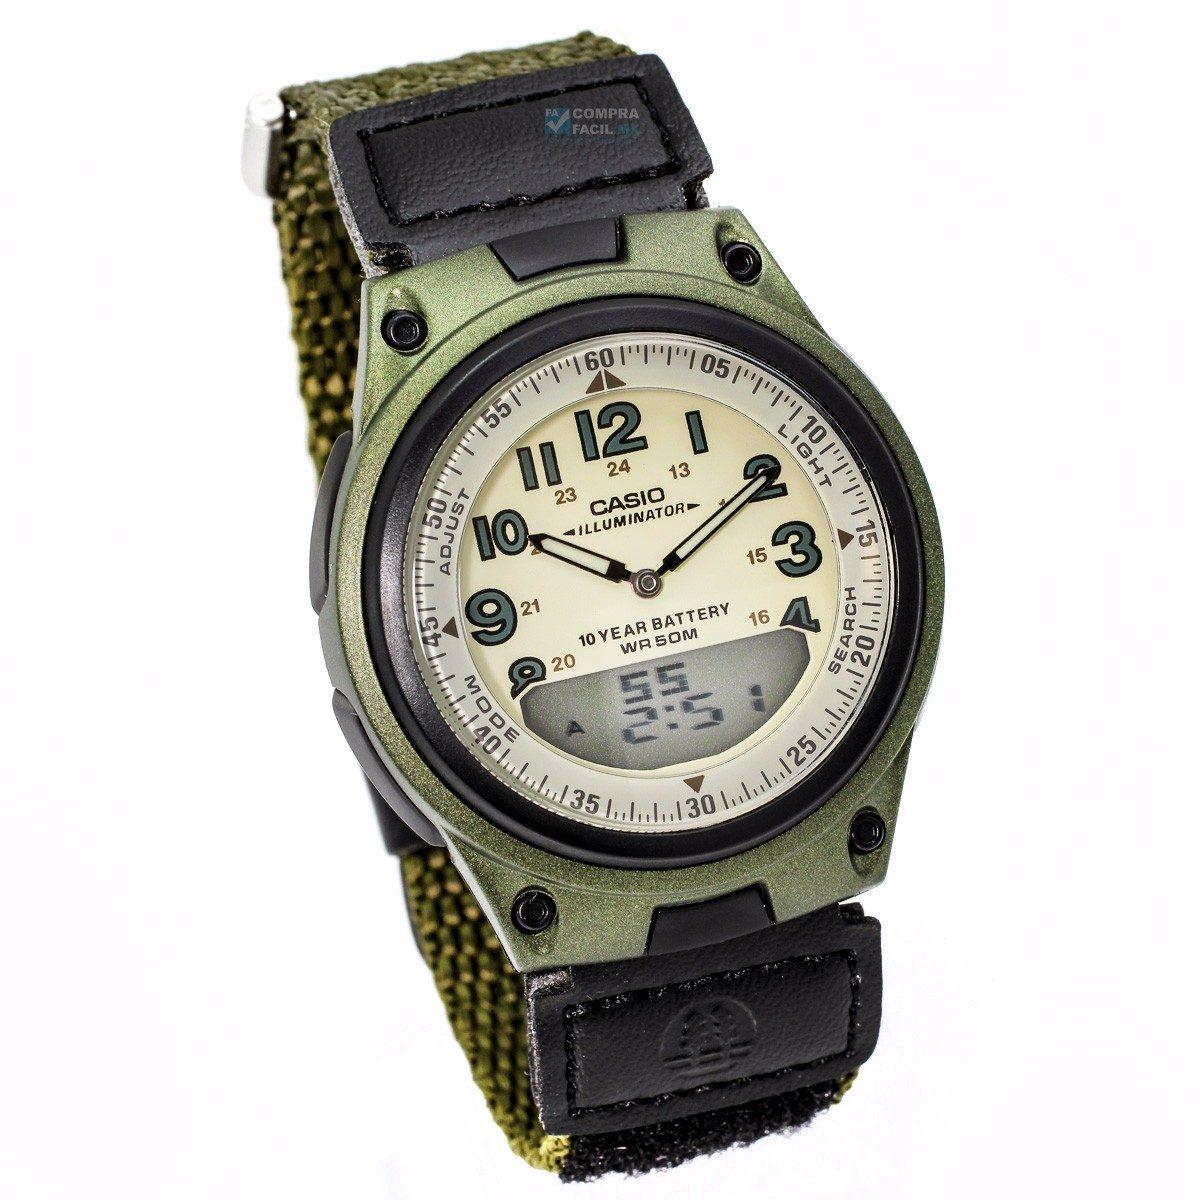 Luz Original Reloj Verde Aw Telememo 80 Gratis Casio Envío MzSpqUV